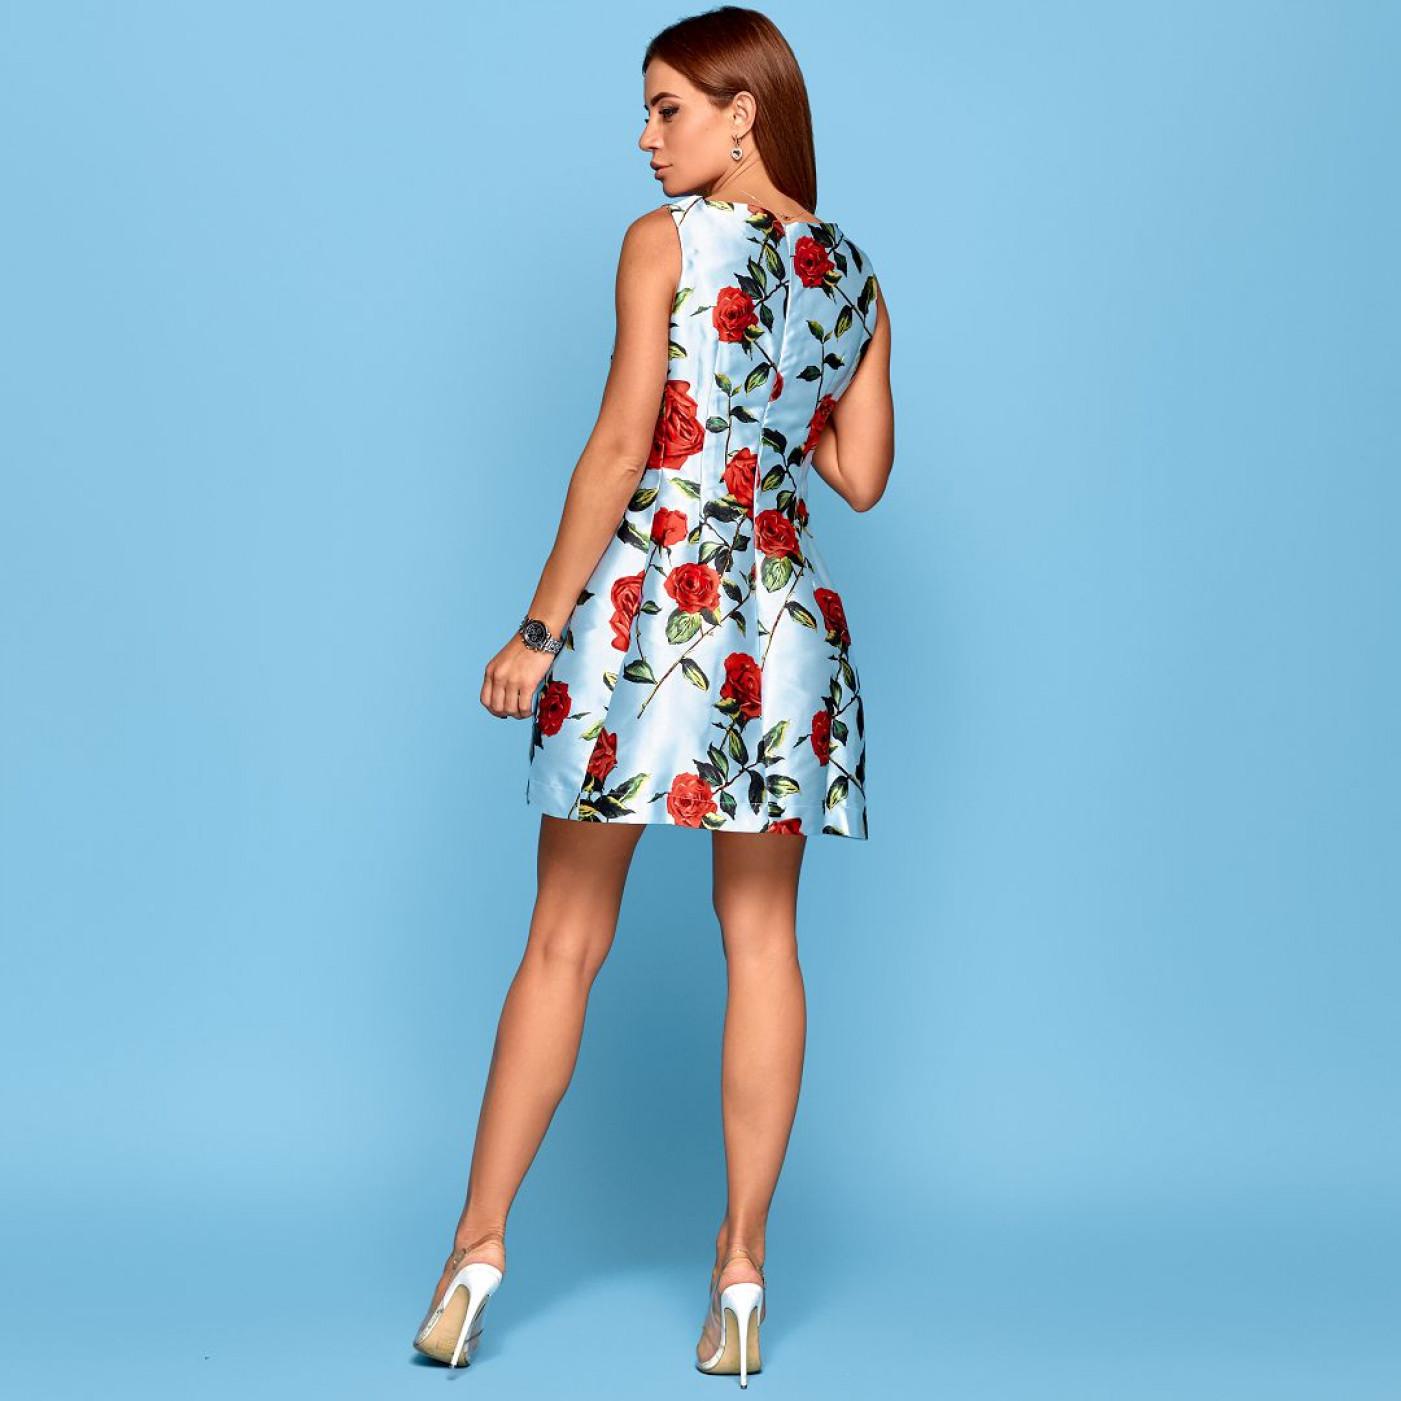 Яскрава сукня в трояндах 10527